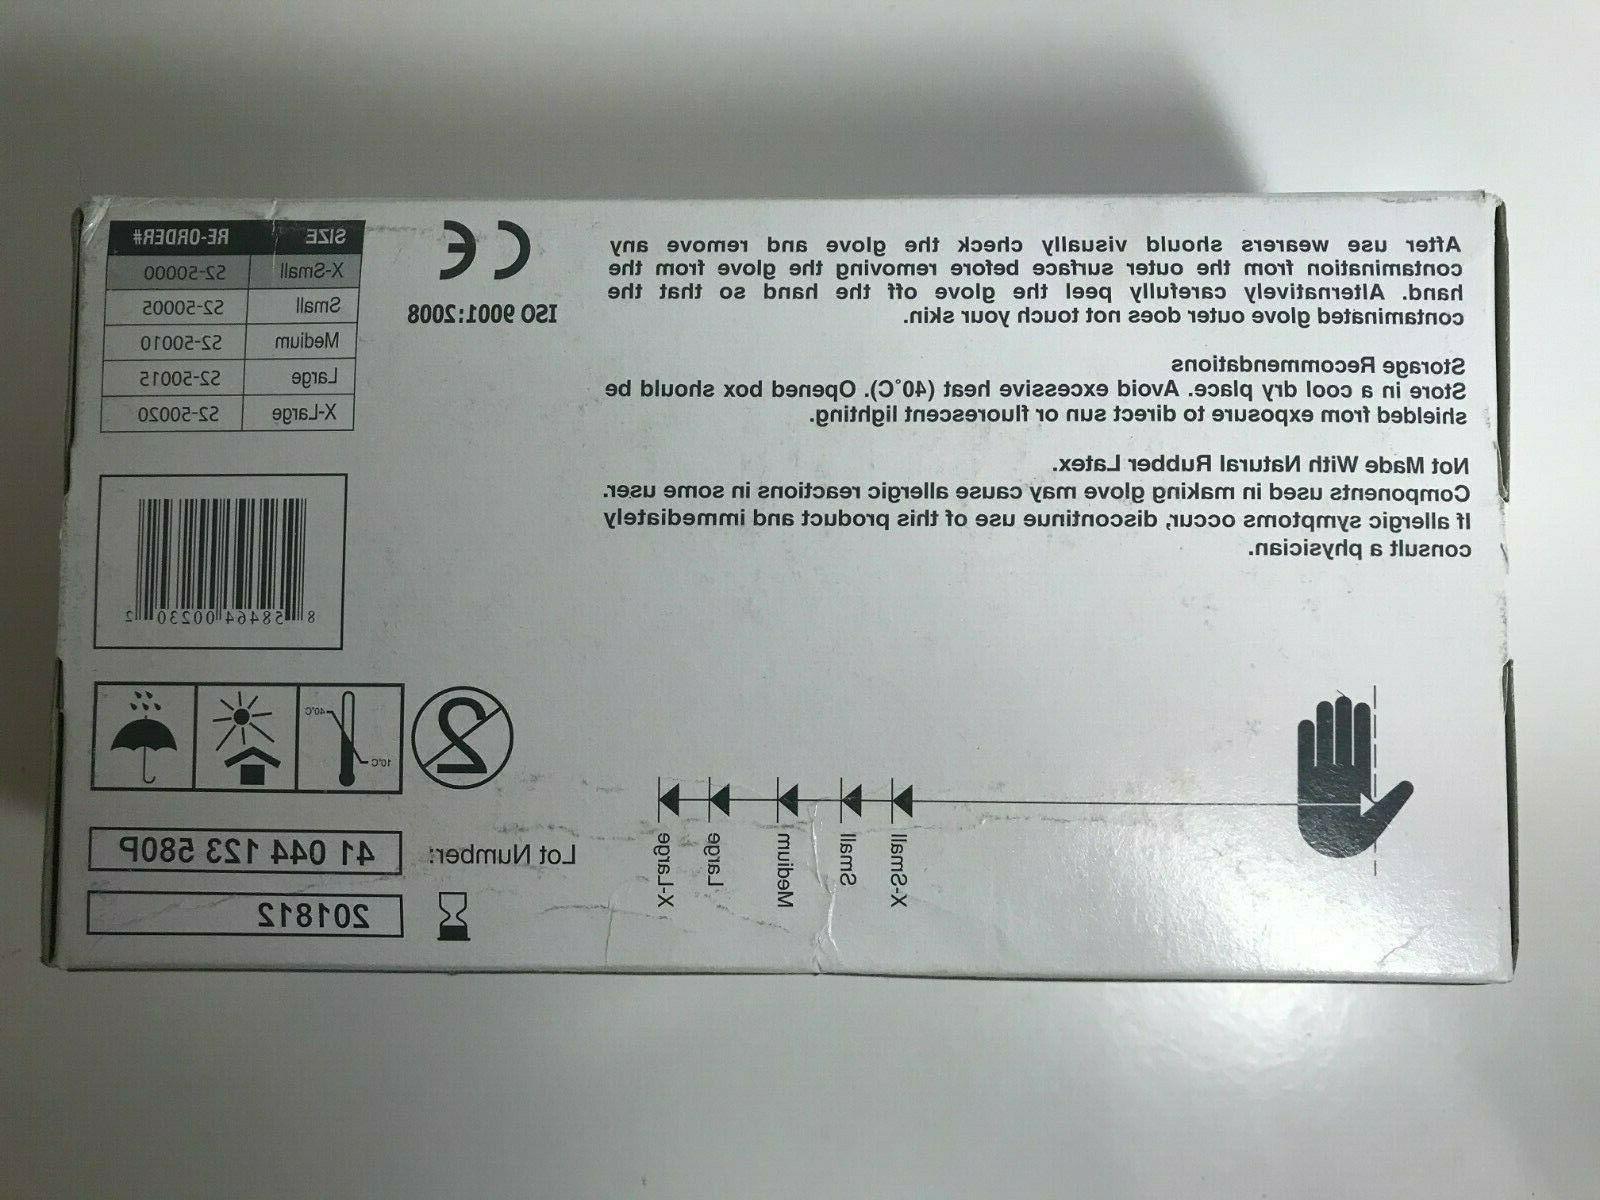 Skintx Nitrile Extra 100 Per Box